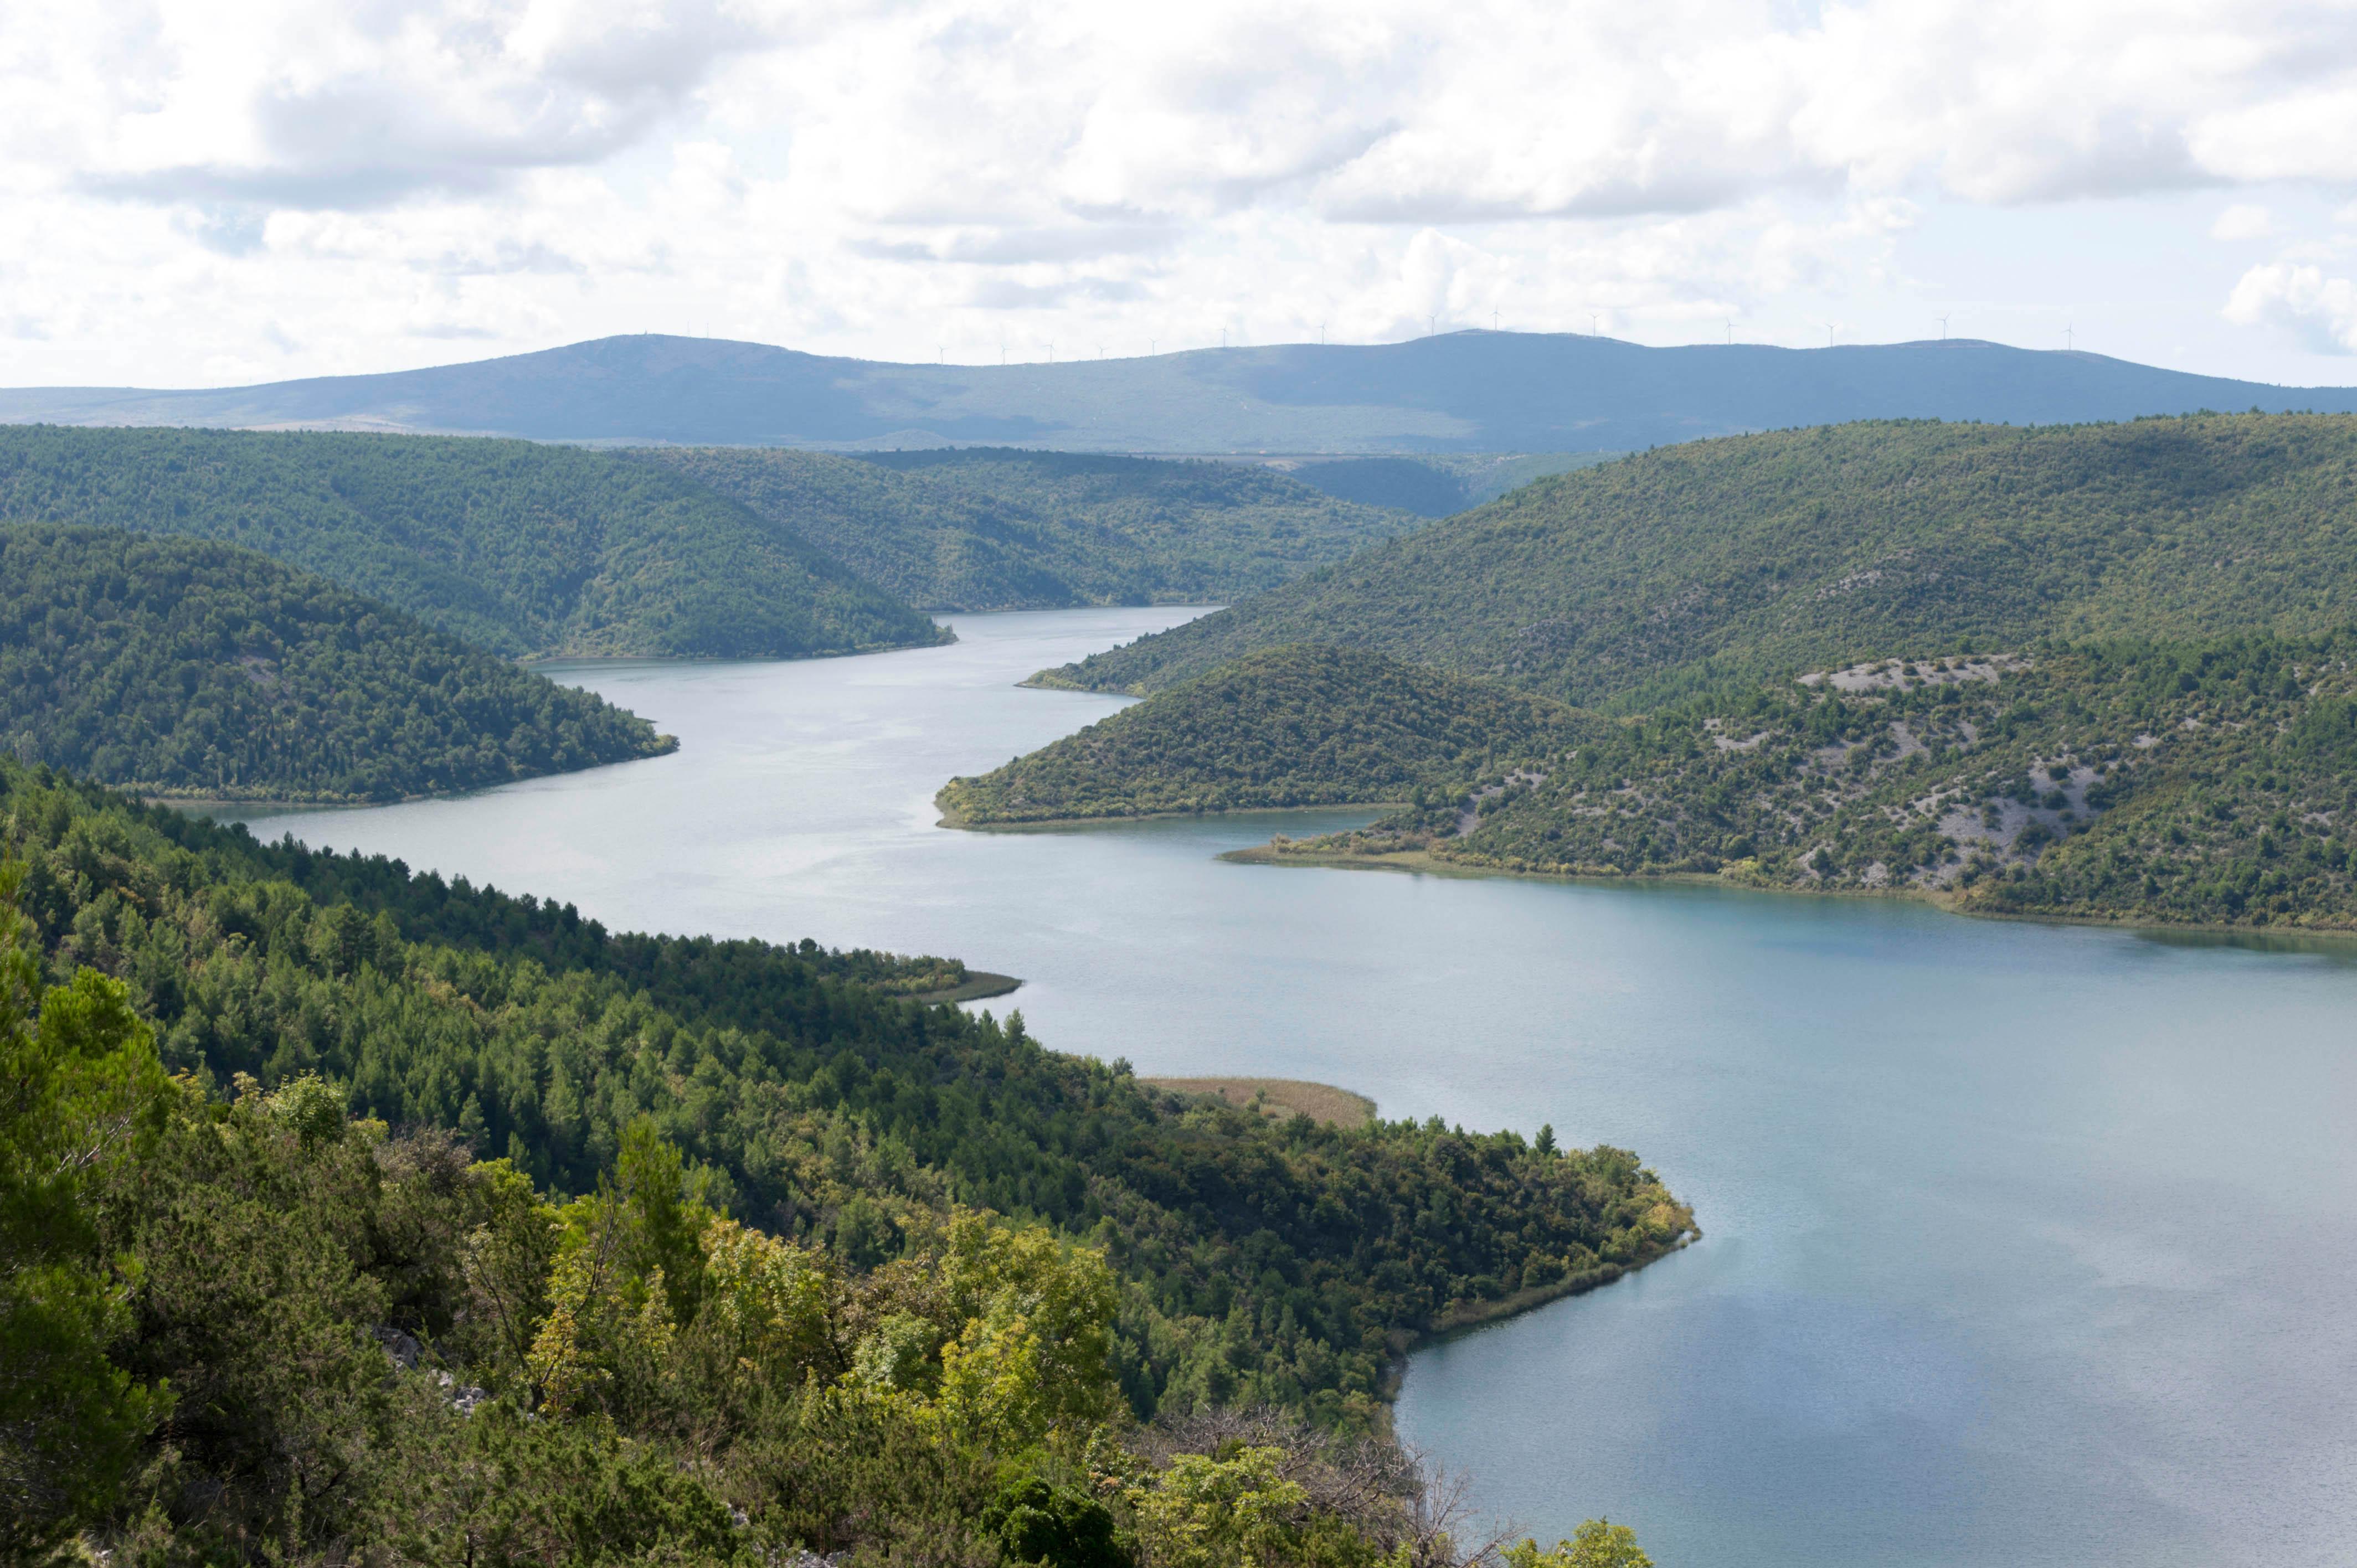 9472-Parc national Krka (Dalmatie du Nord)